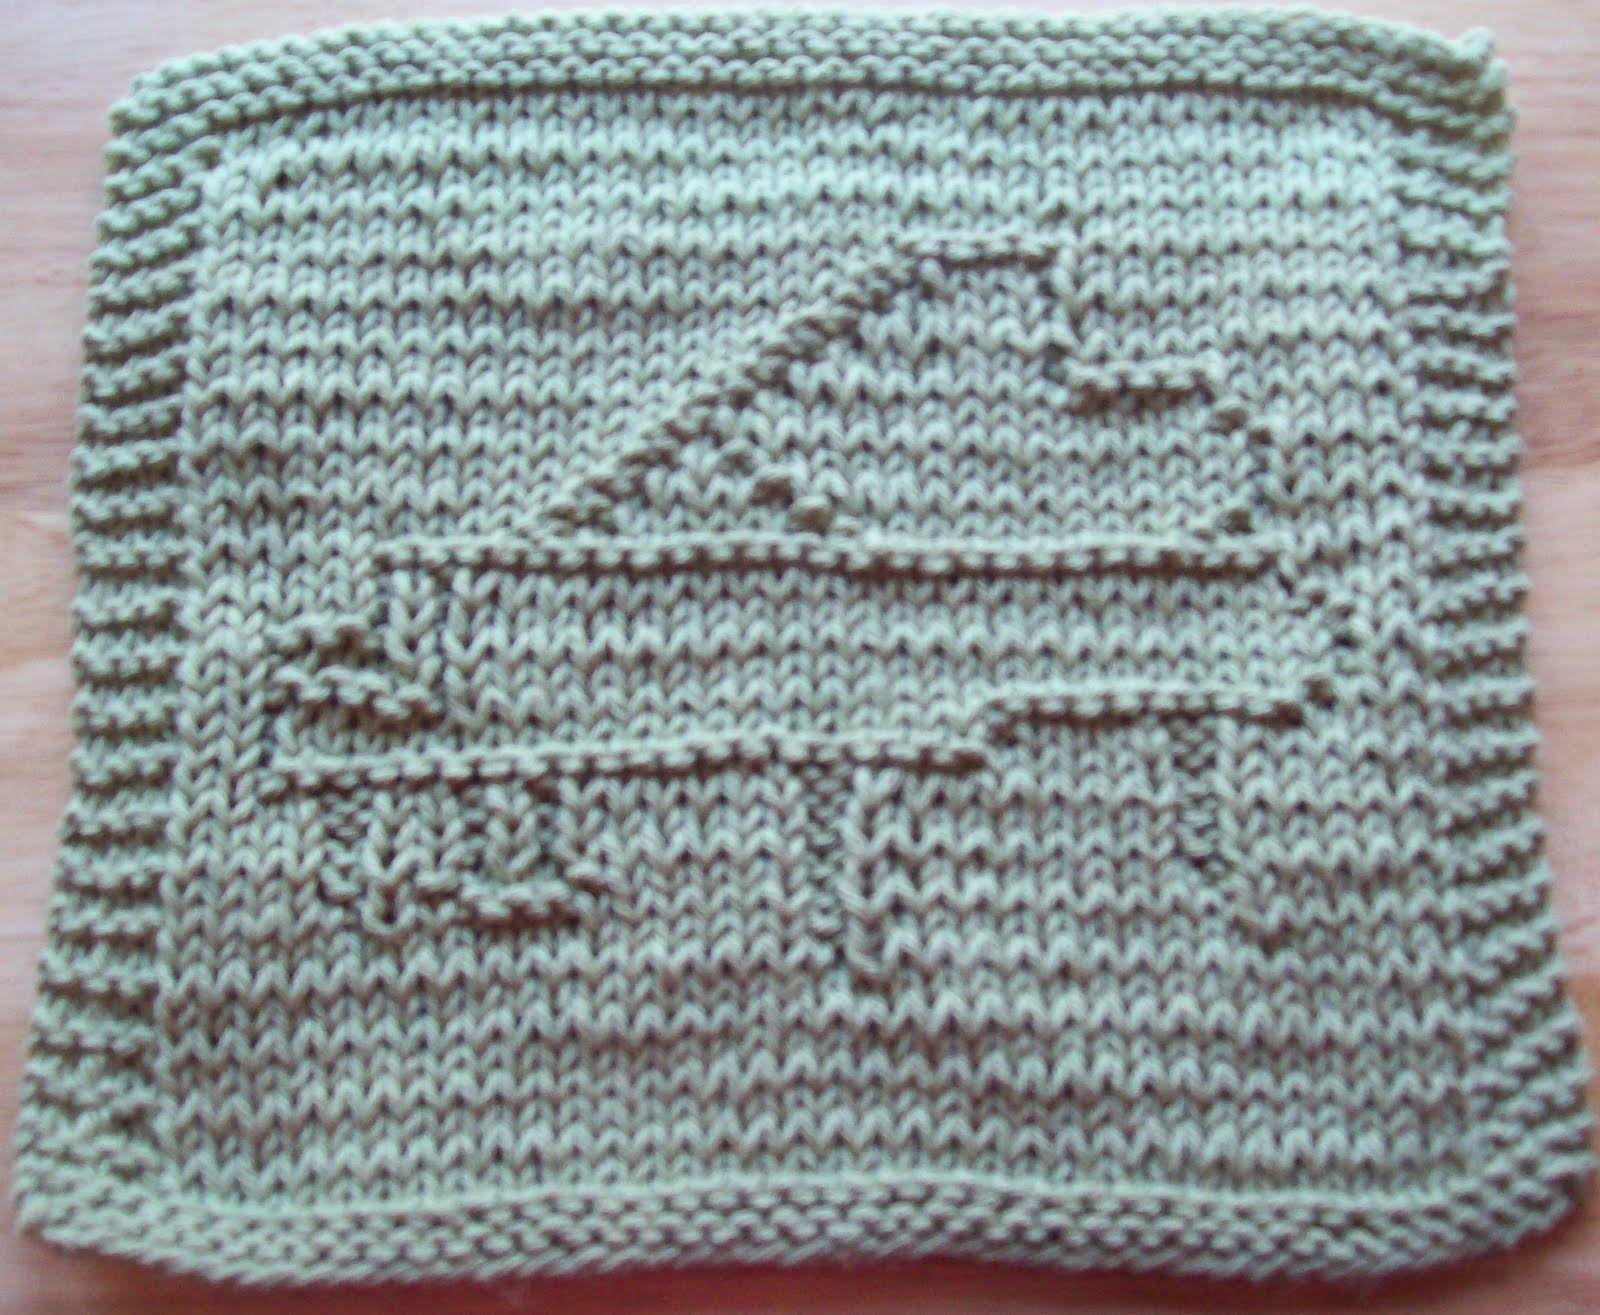 Digknitty designs grand piano knit dishcloth pattern pinteres digknitty designs grand piano knit dishcloth pattern more bankloansurffo Gallery